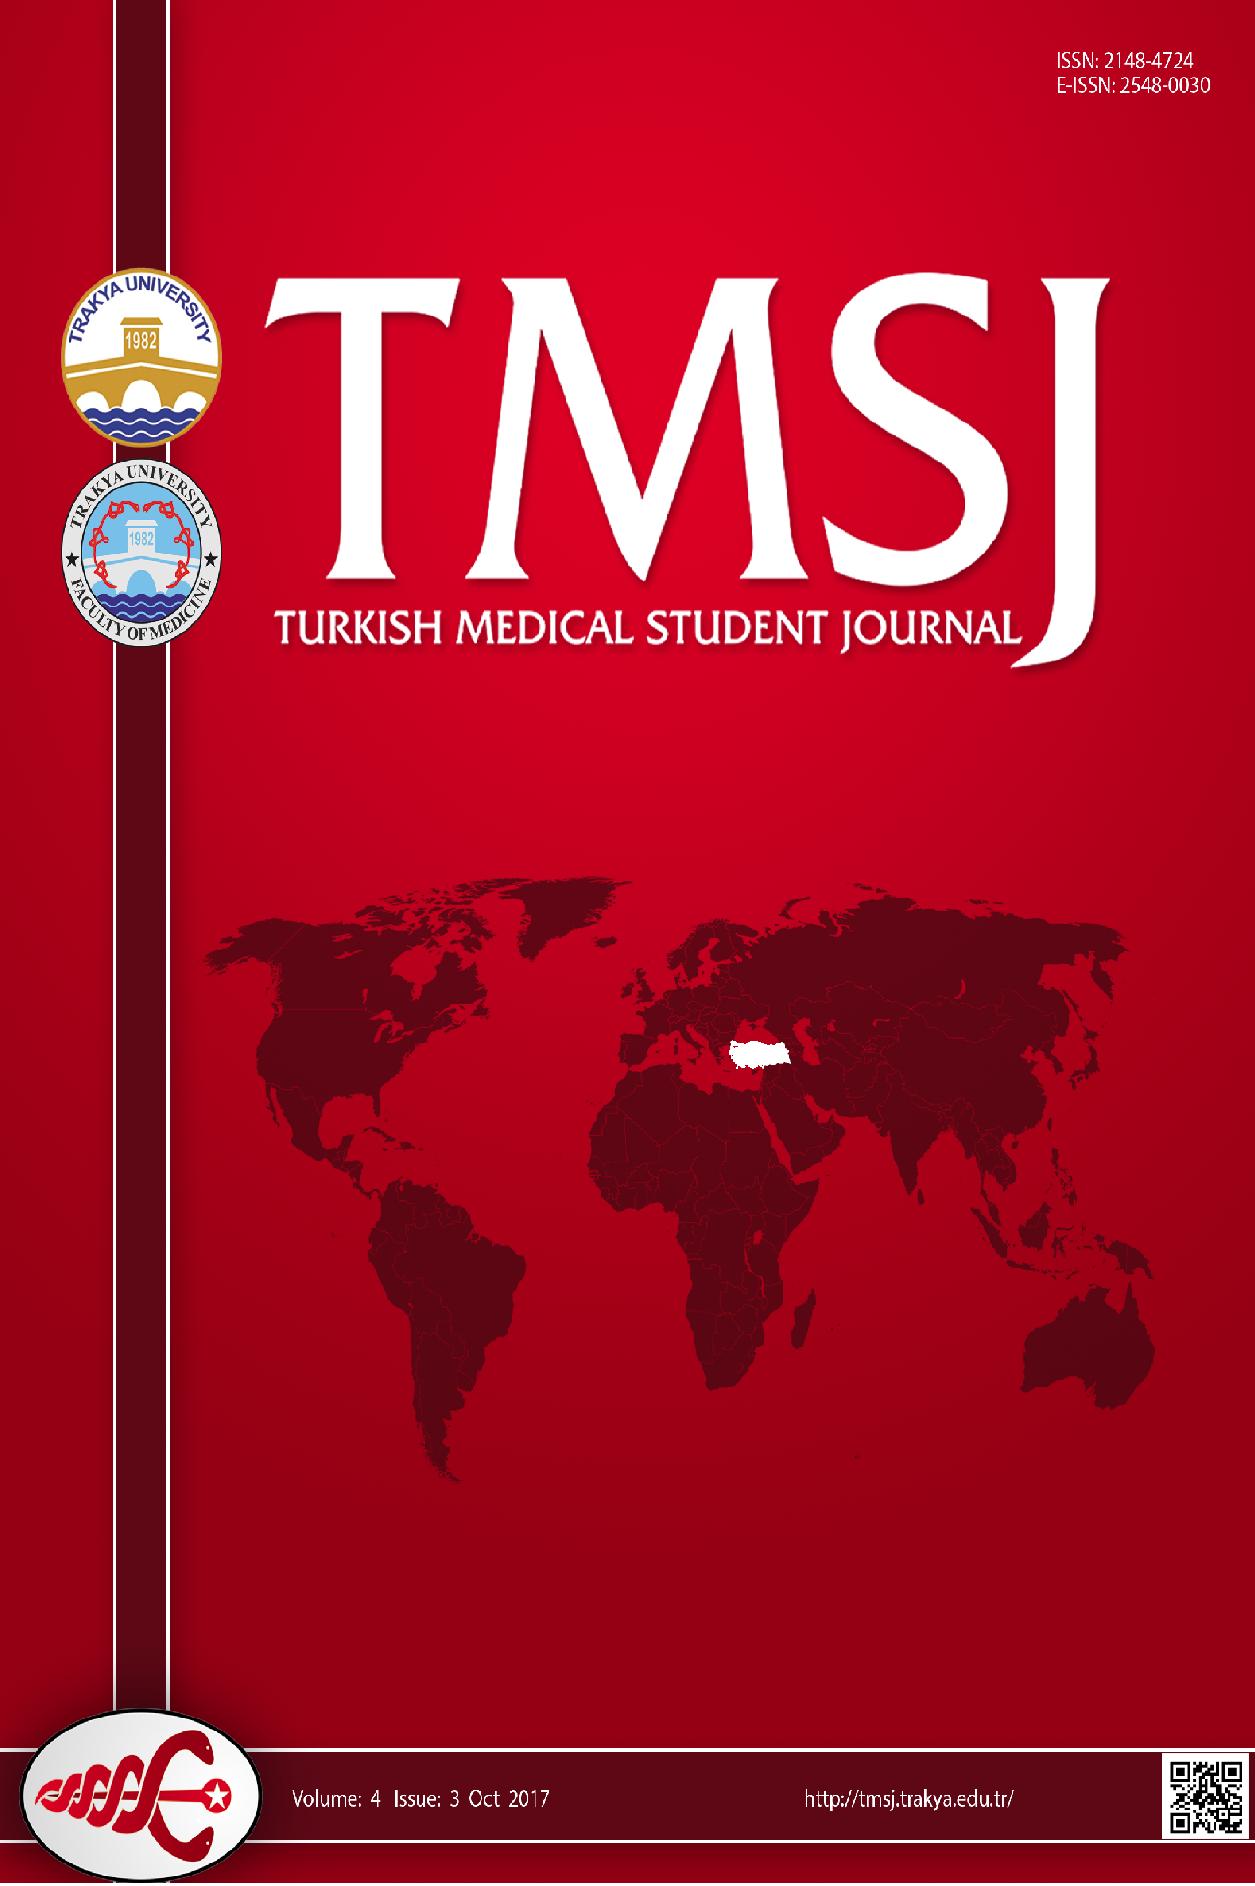 Turkish Medical Student Journal